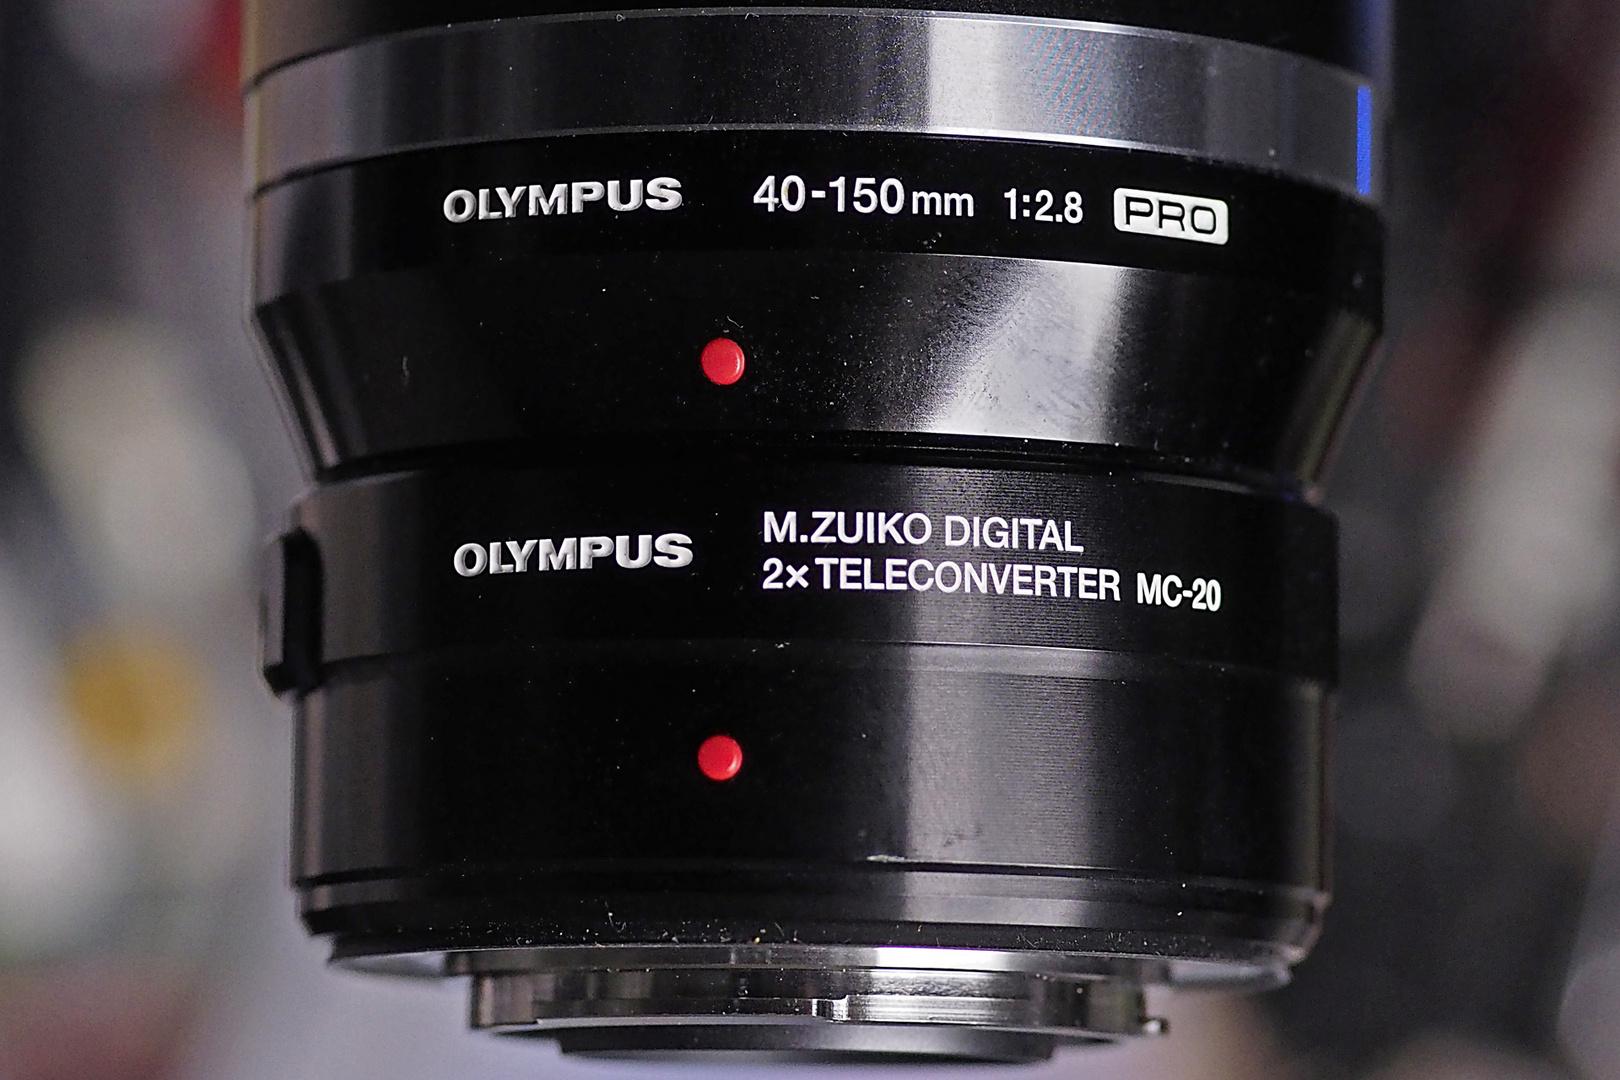 Der langersehnte Neue: Olympus MC-20 2x Telekonverter